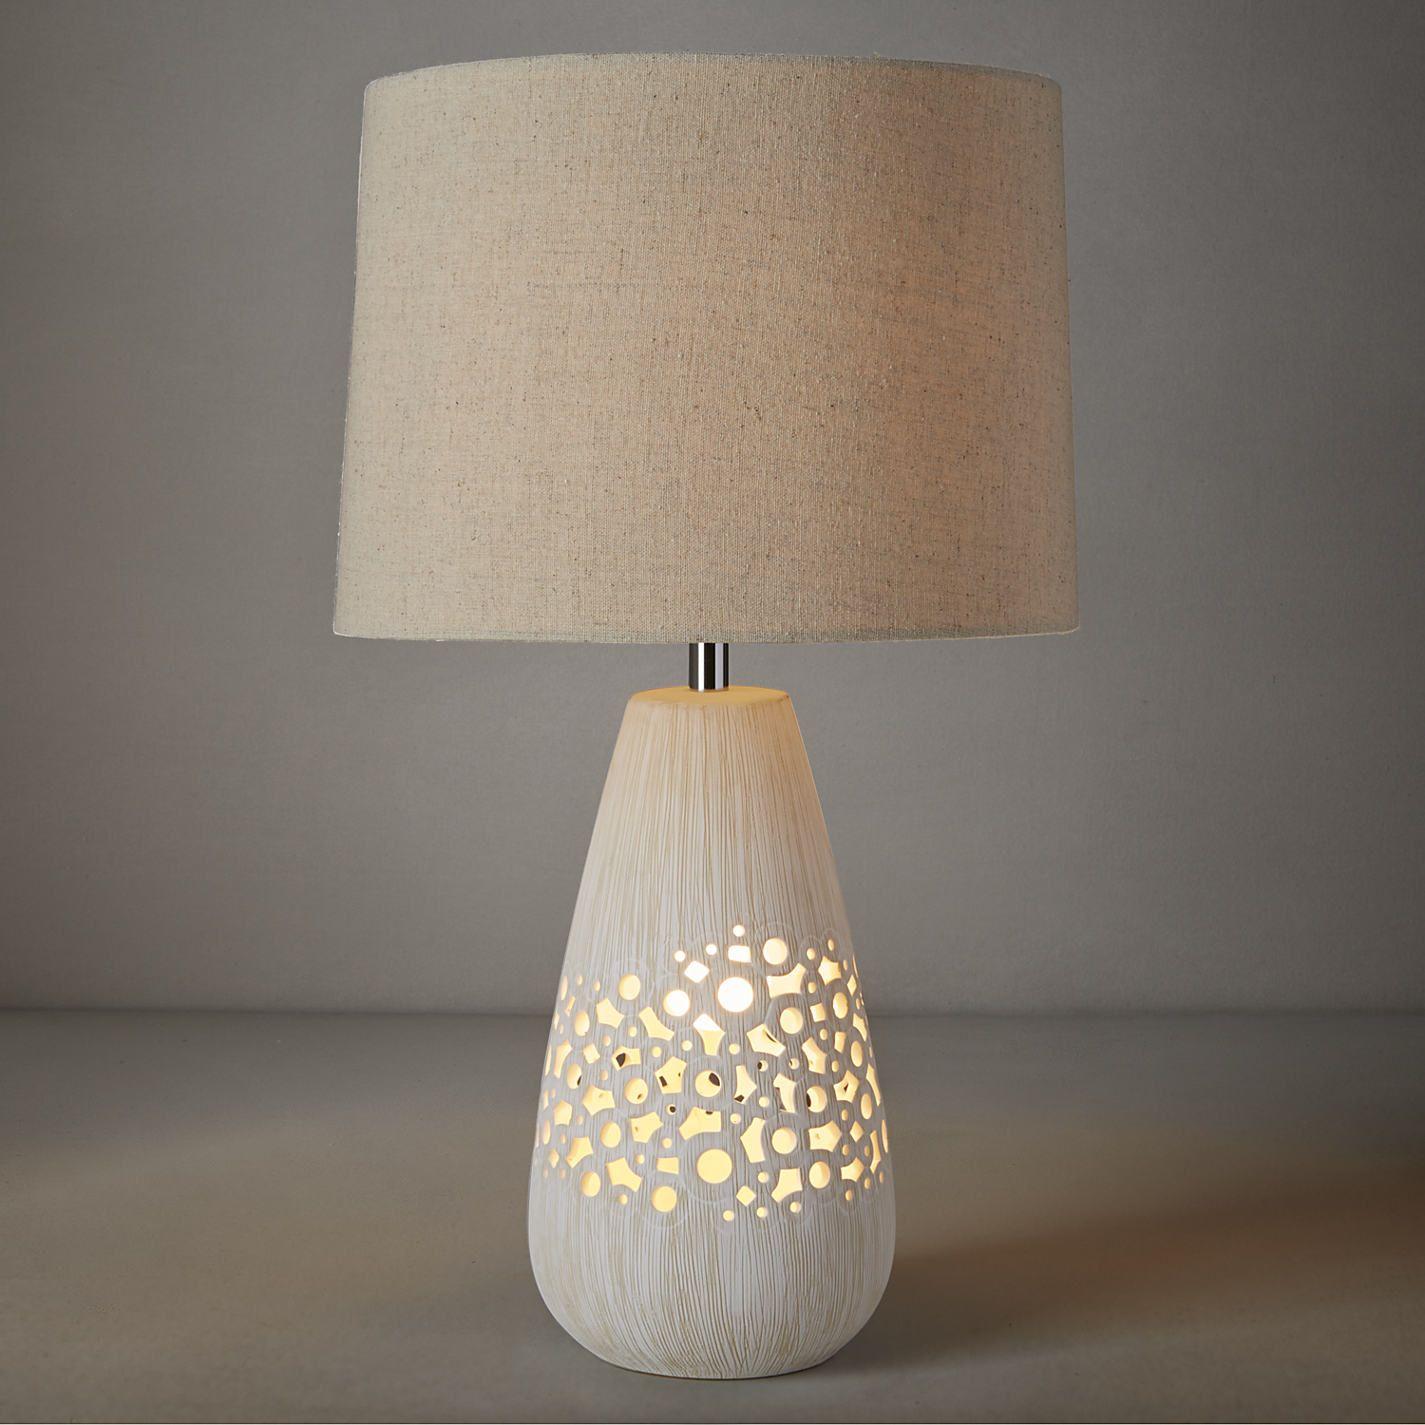 Lampa Unikat Keramicka Table Desk John Lewis Floor Lamps Garden Cottage Ceramic